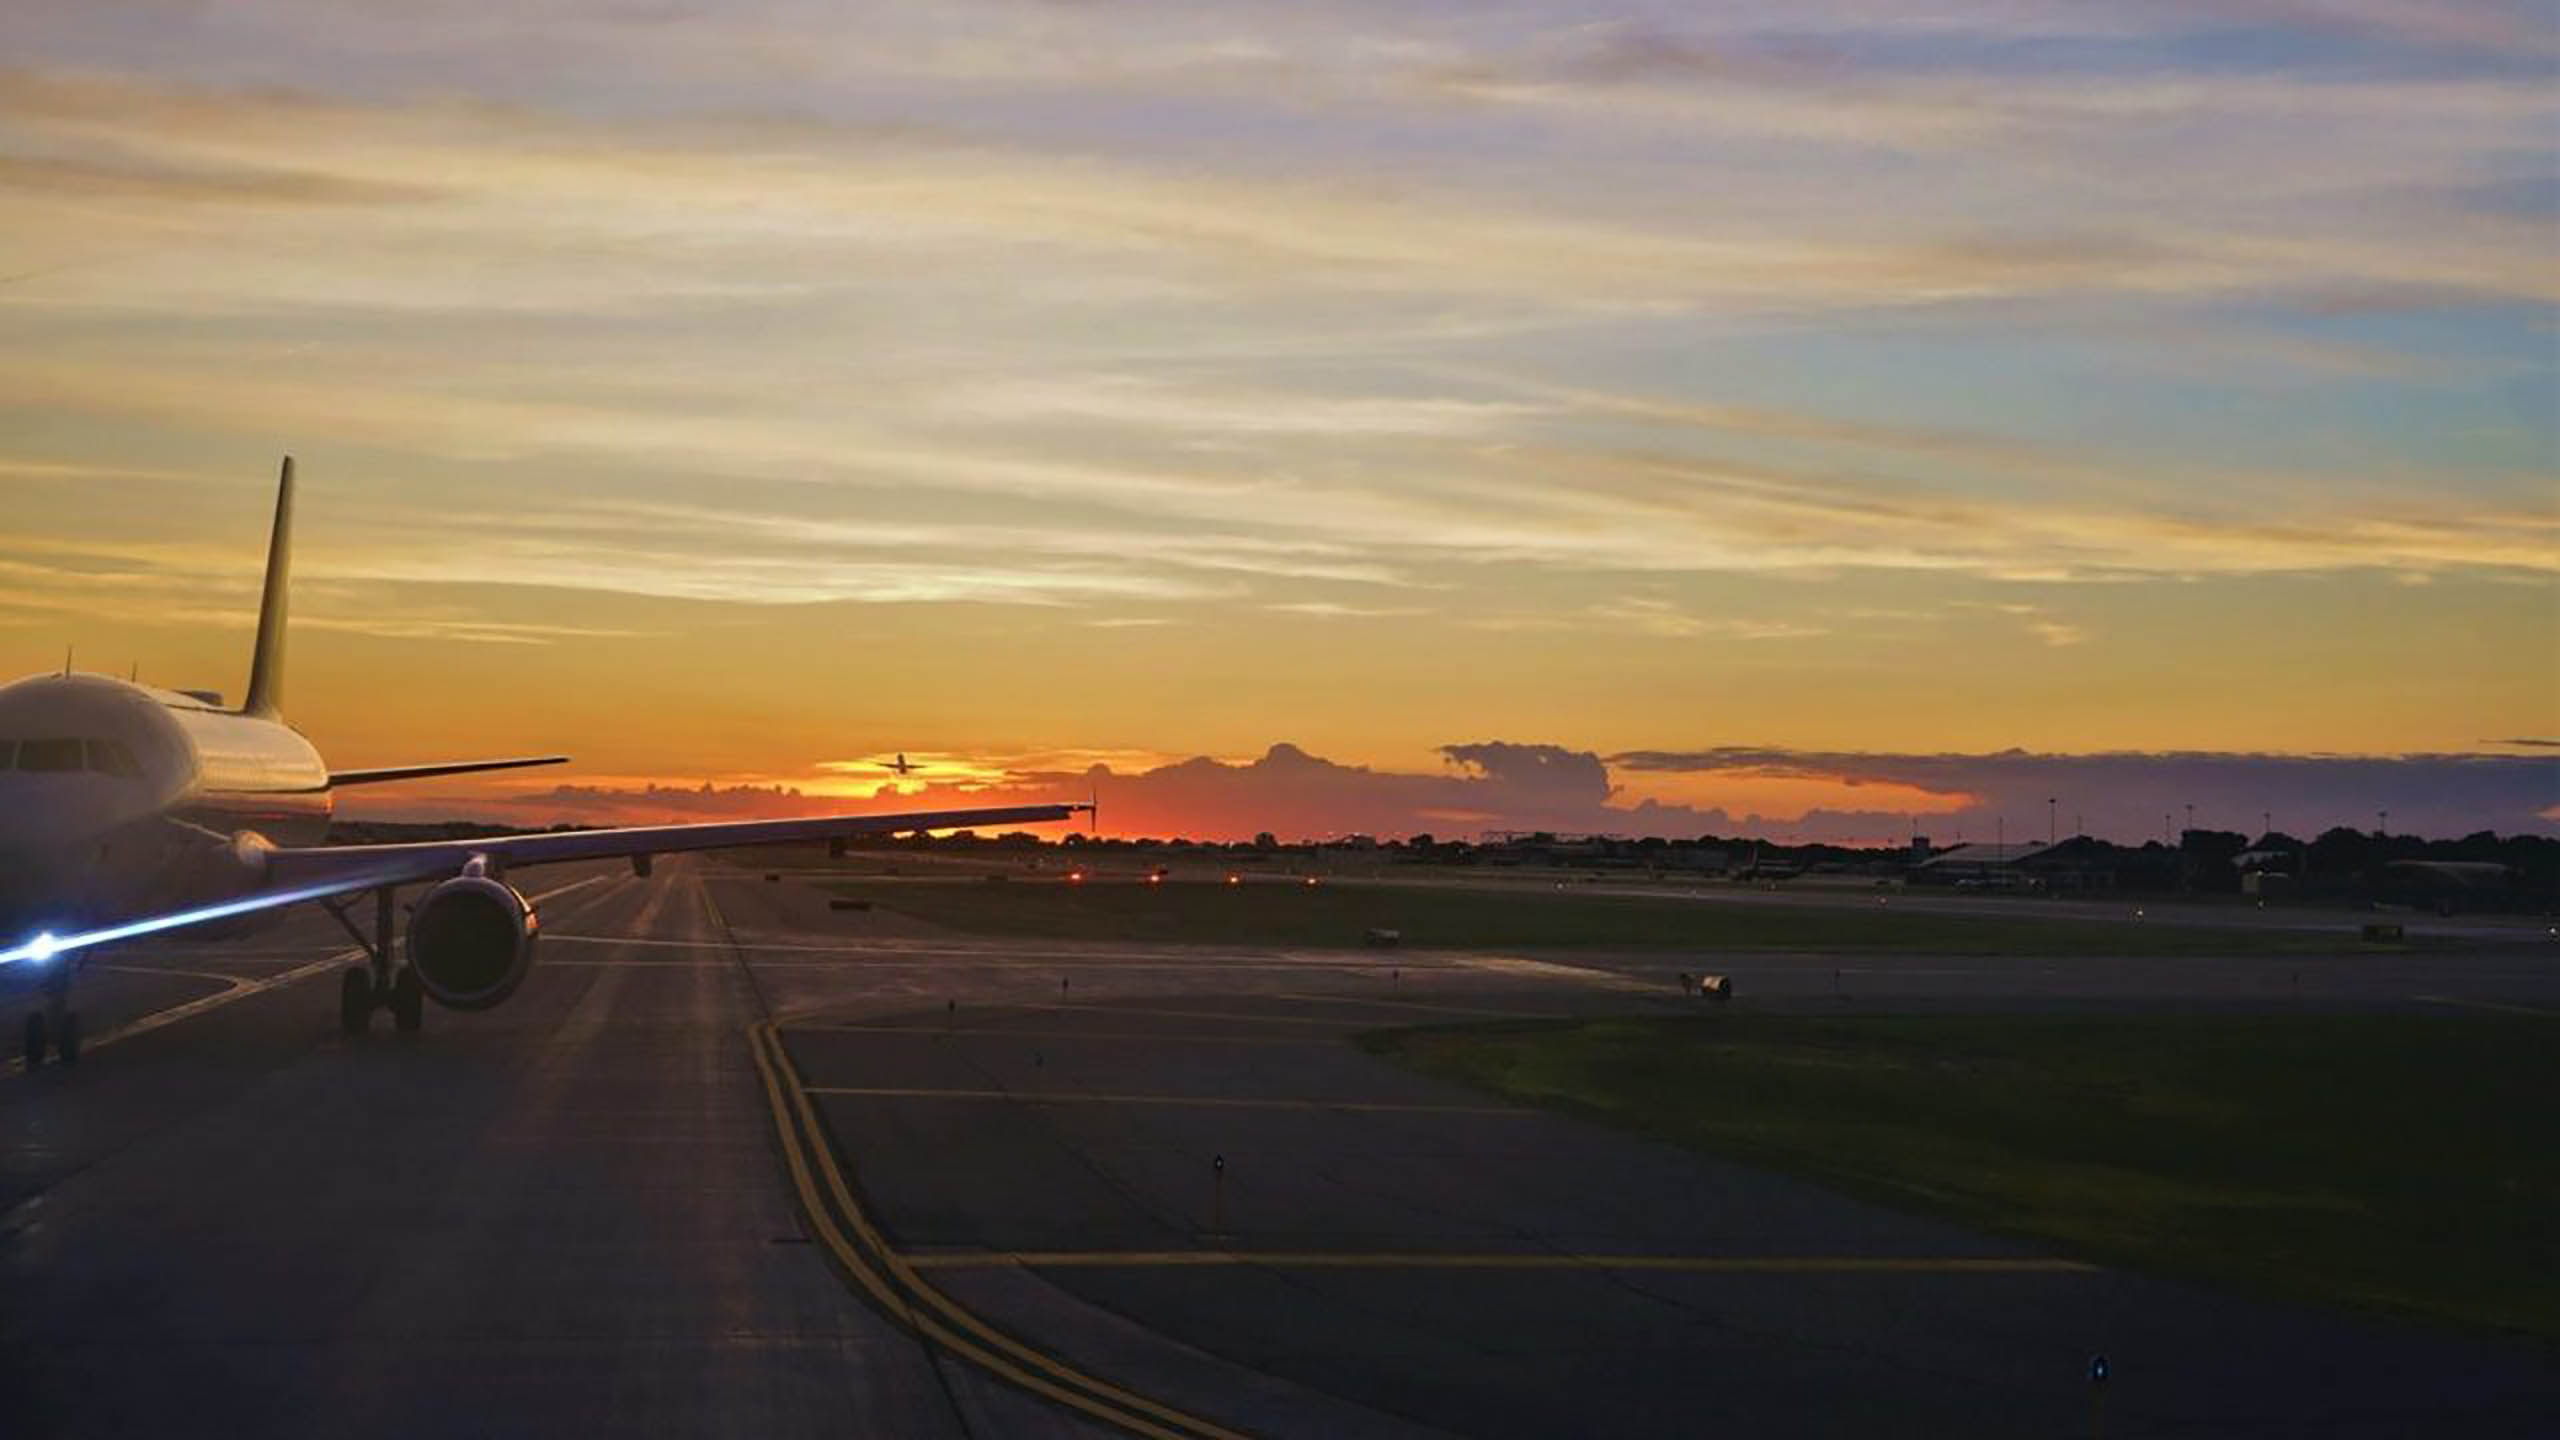 viaje, viaje seguro, medidas de seguridad, aeropuerto